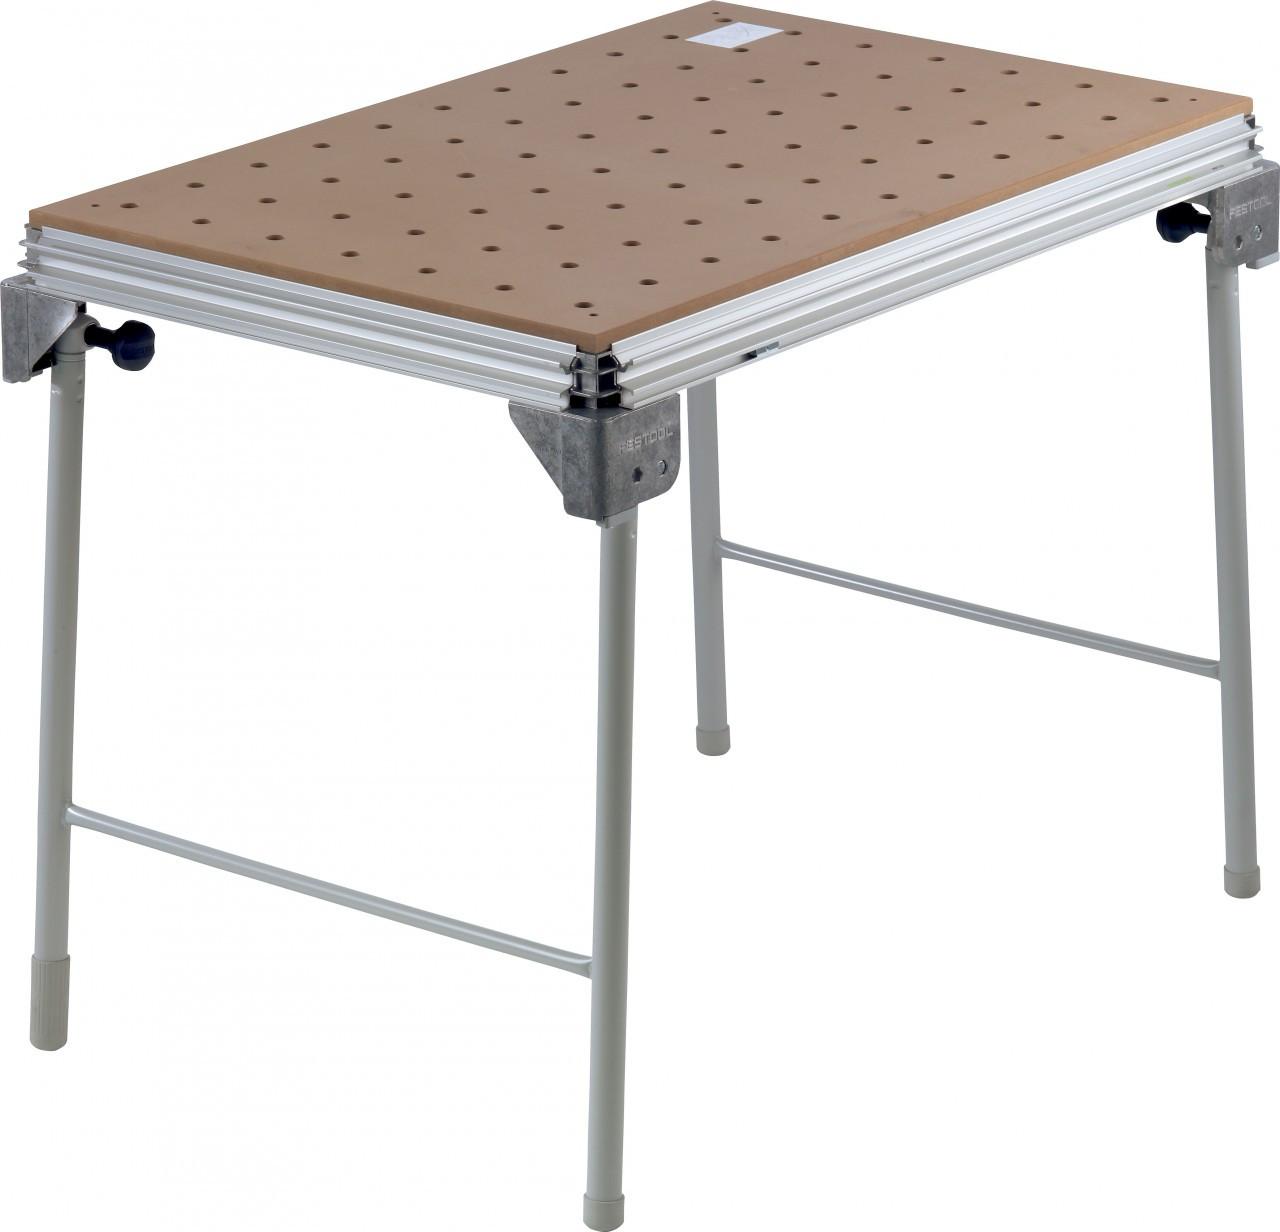 festool mft 3 multifunction table basic 500608 replaces 495888. Black Bedroom Furniture Sets. Home Design Ideas